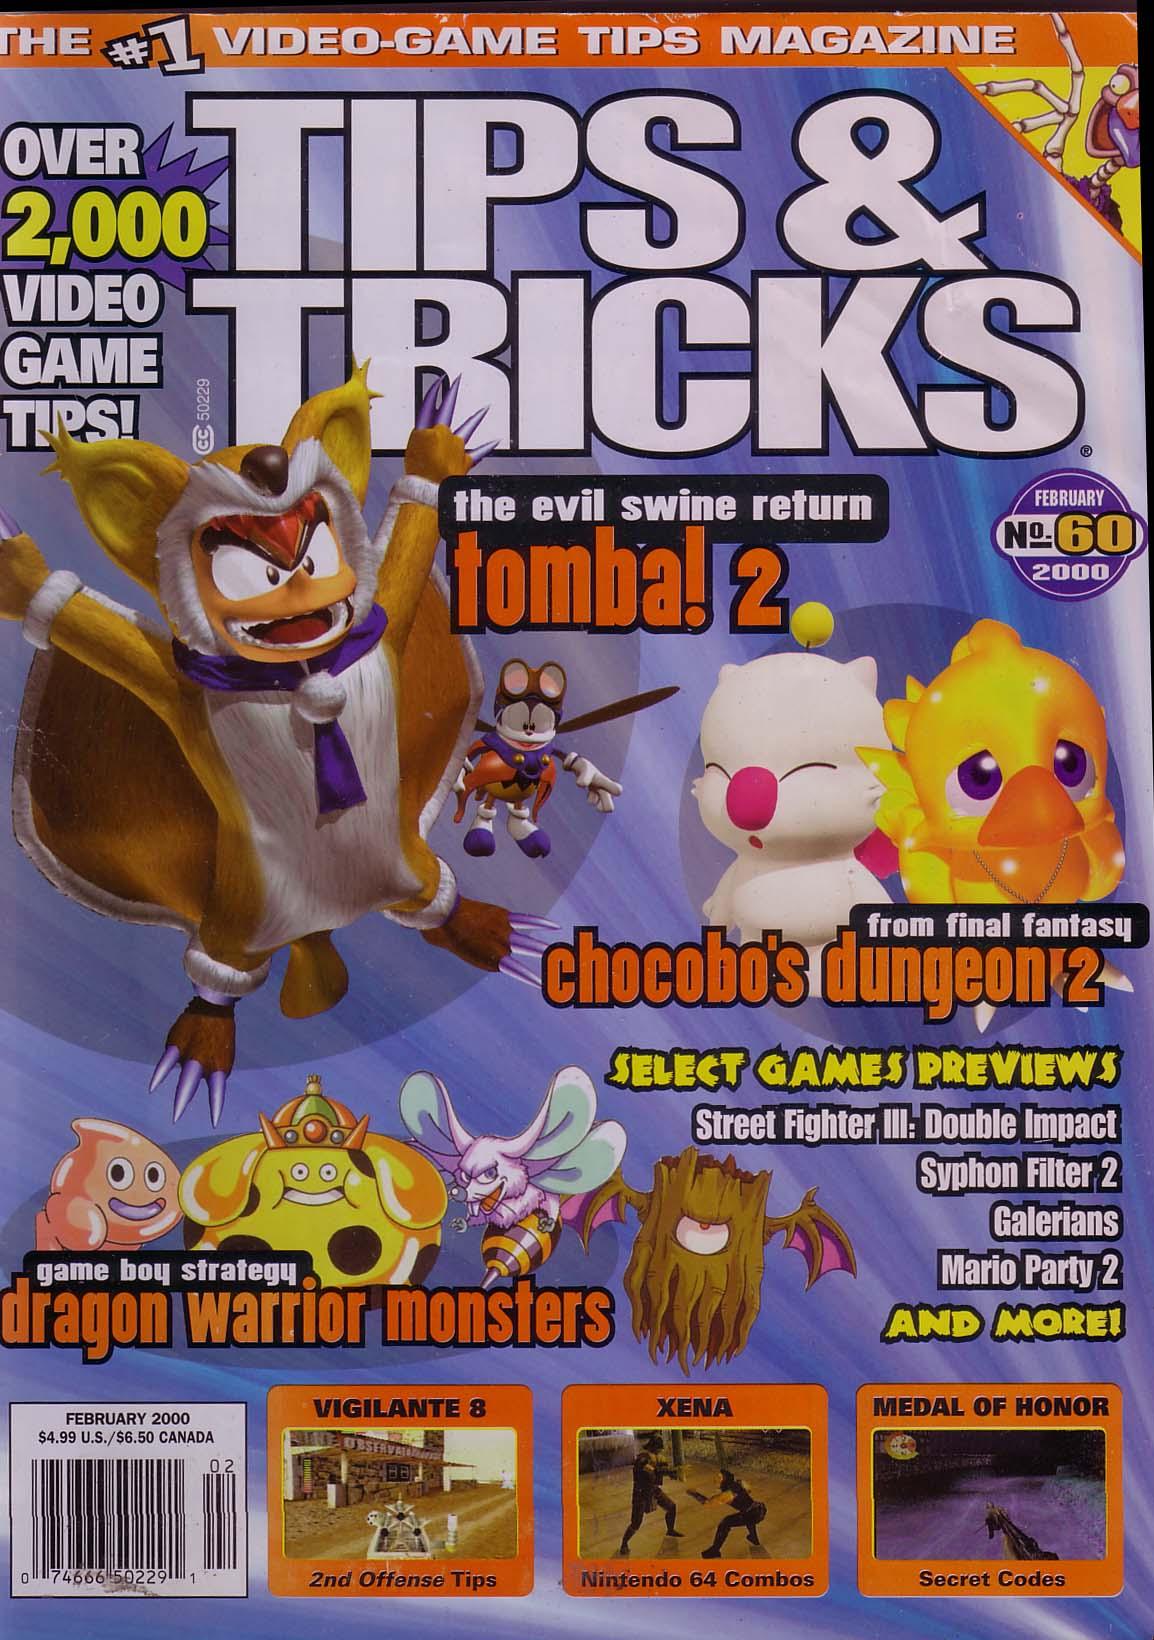 TipsandTricks_Feb_2000_Xena.jpg